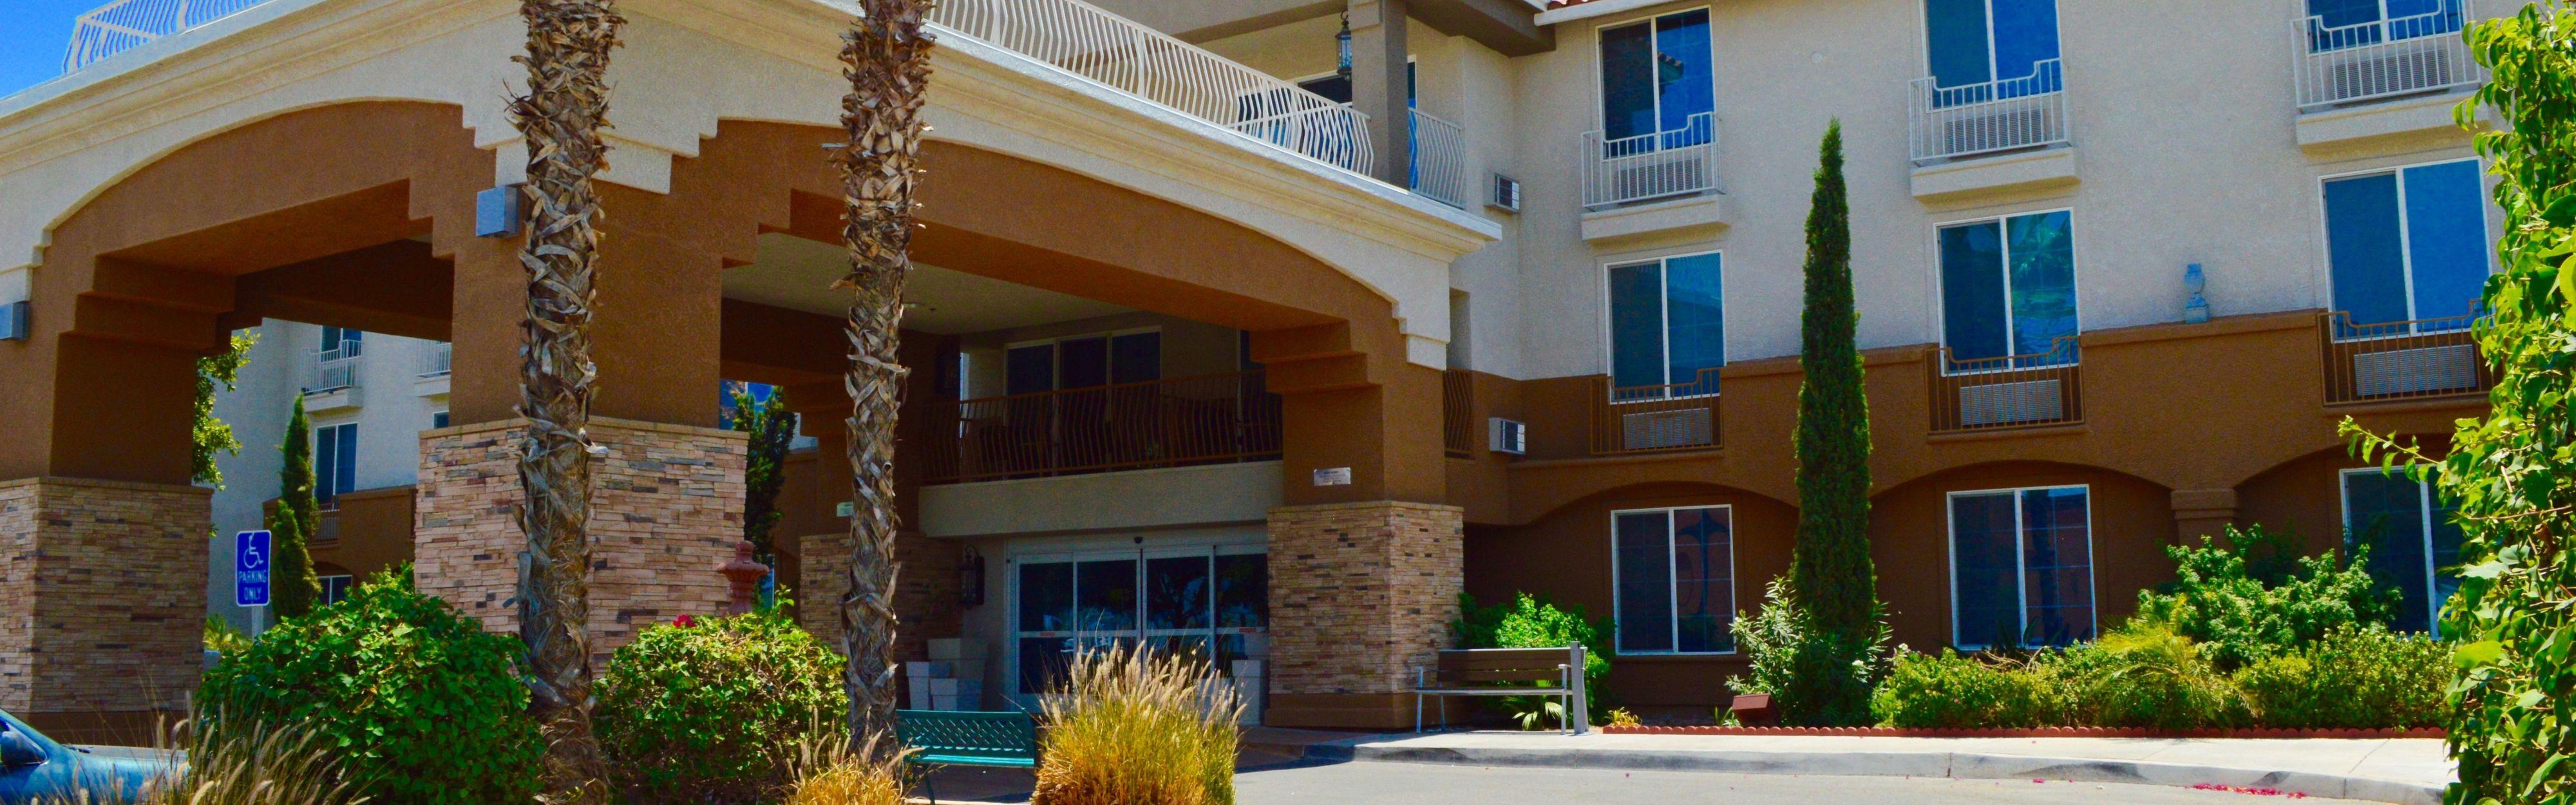 Holiday Inn Express Calexico image 0